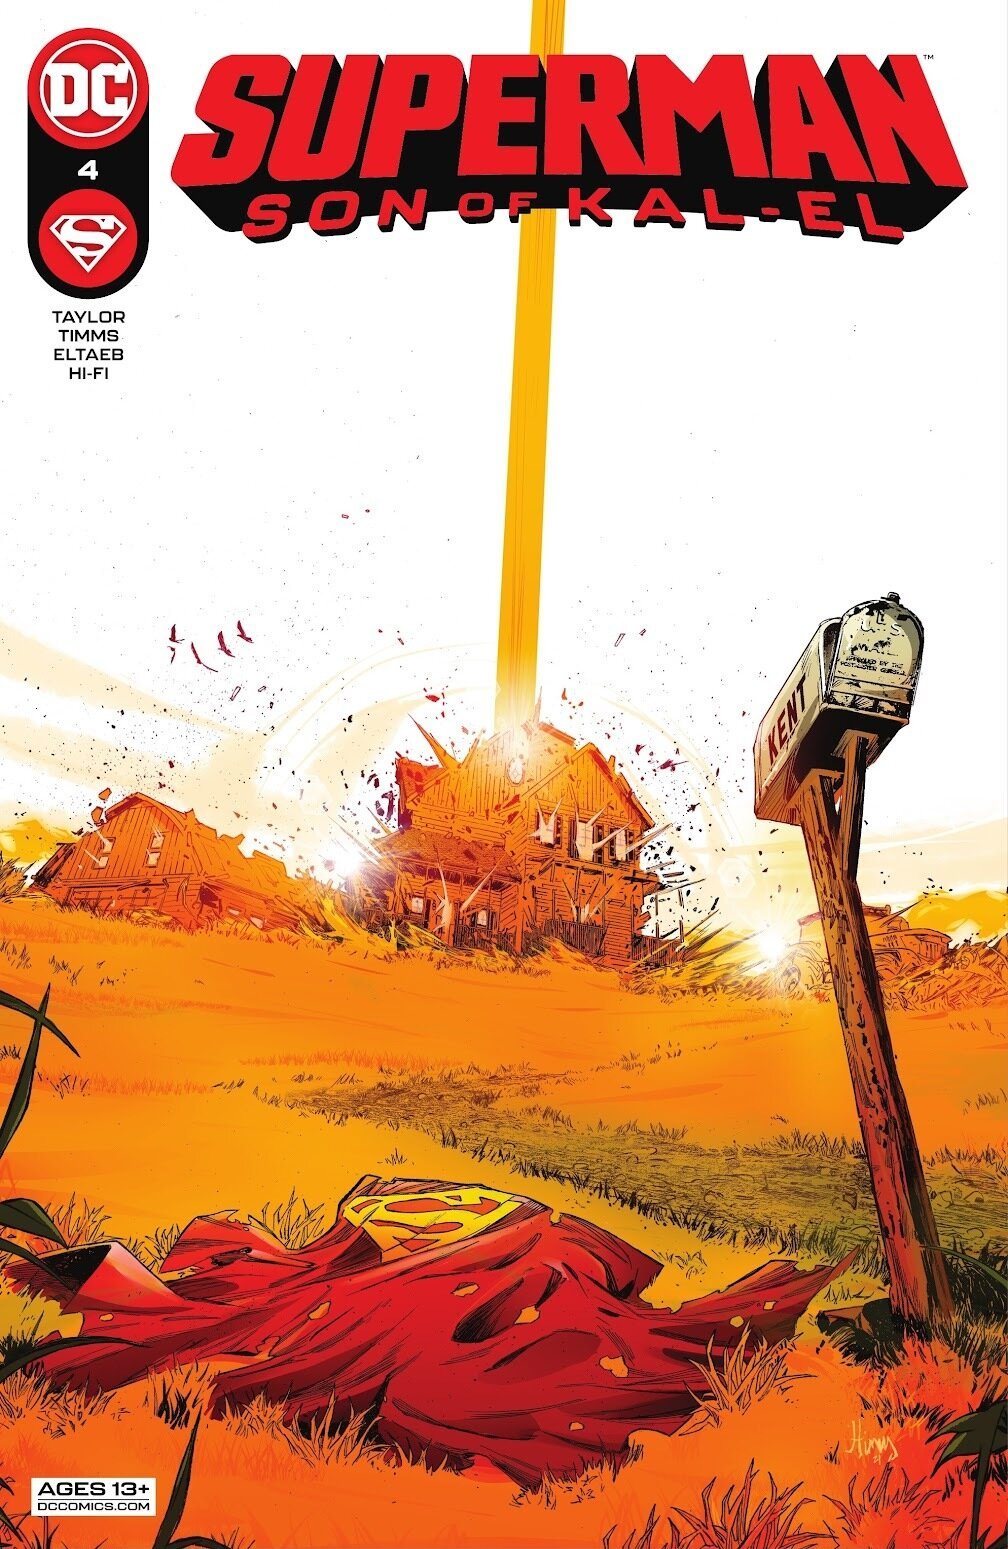 Superman Son of Kal-El 4, cover, 2021, John Timms